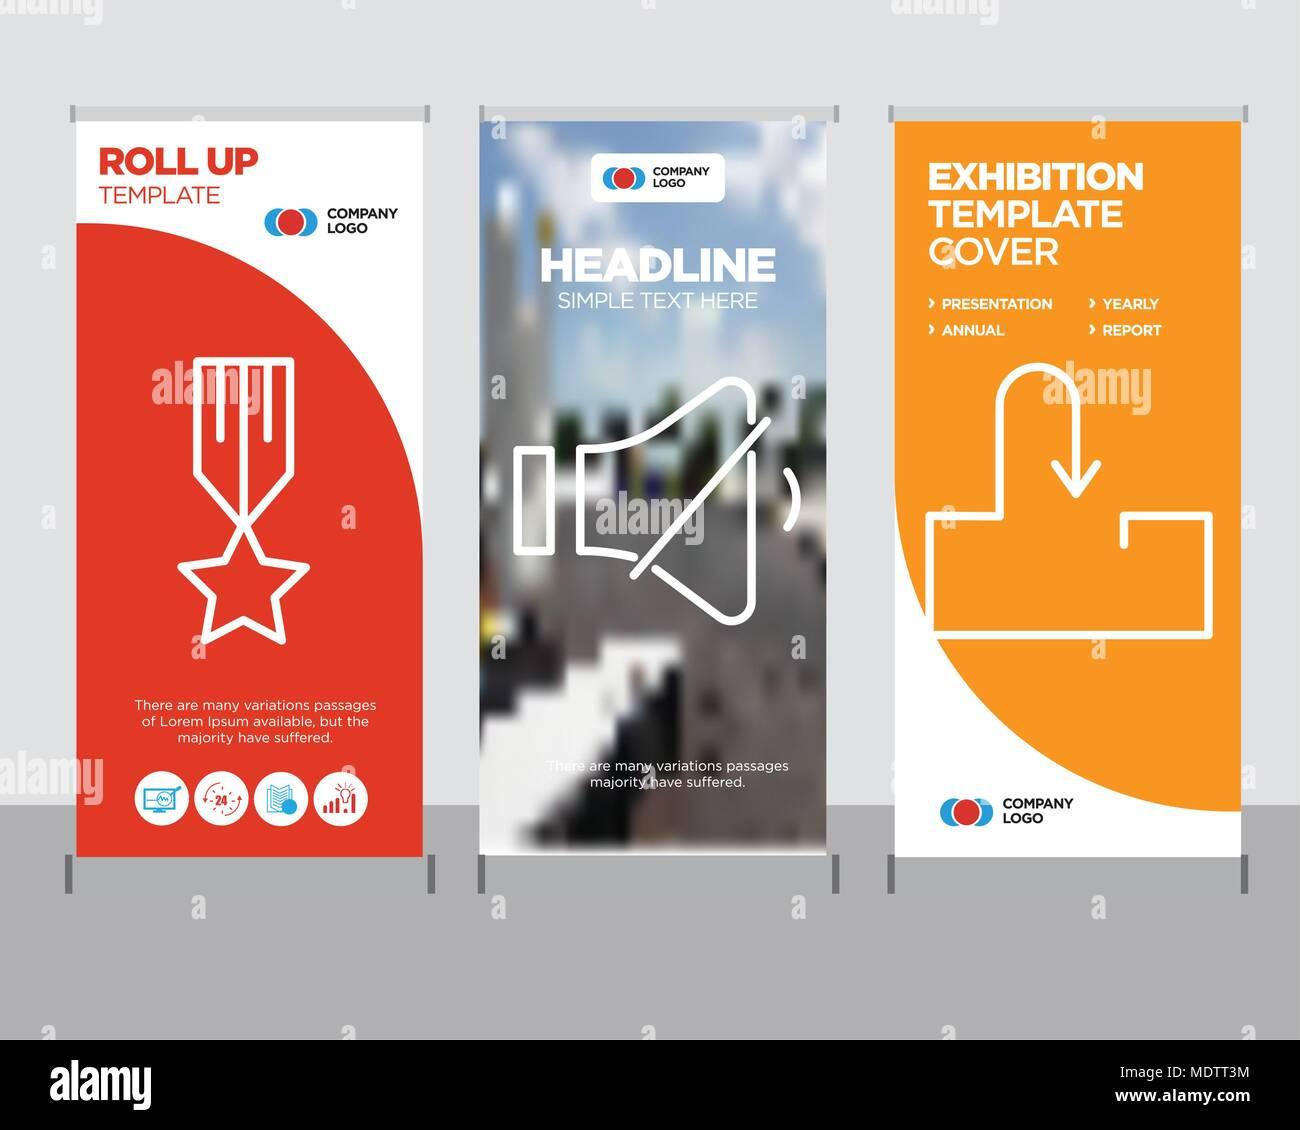 Roll Up Vertical Banner Presentation Publication Imágenes De Stock ...